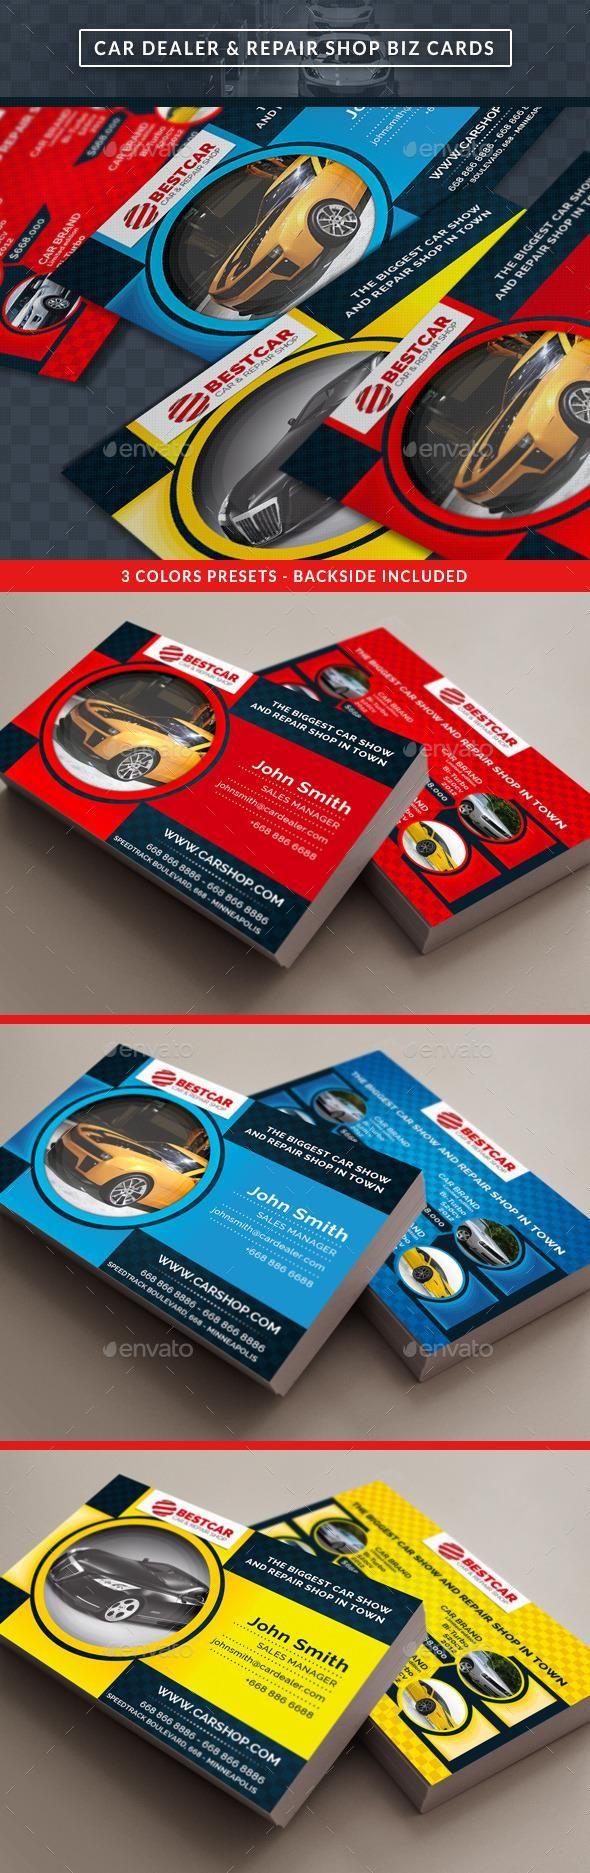 8 best Business cards images on Pinterest | Business cards, Carte de ...